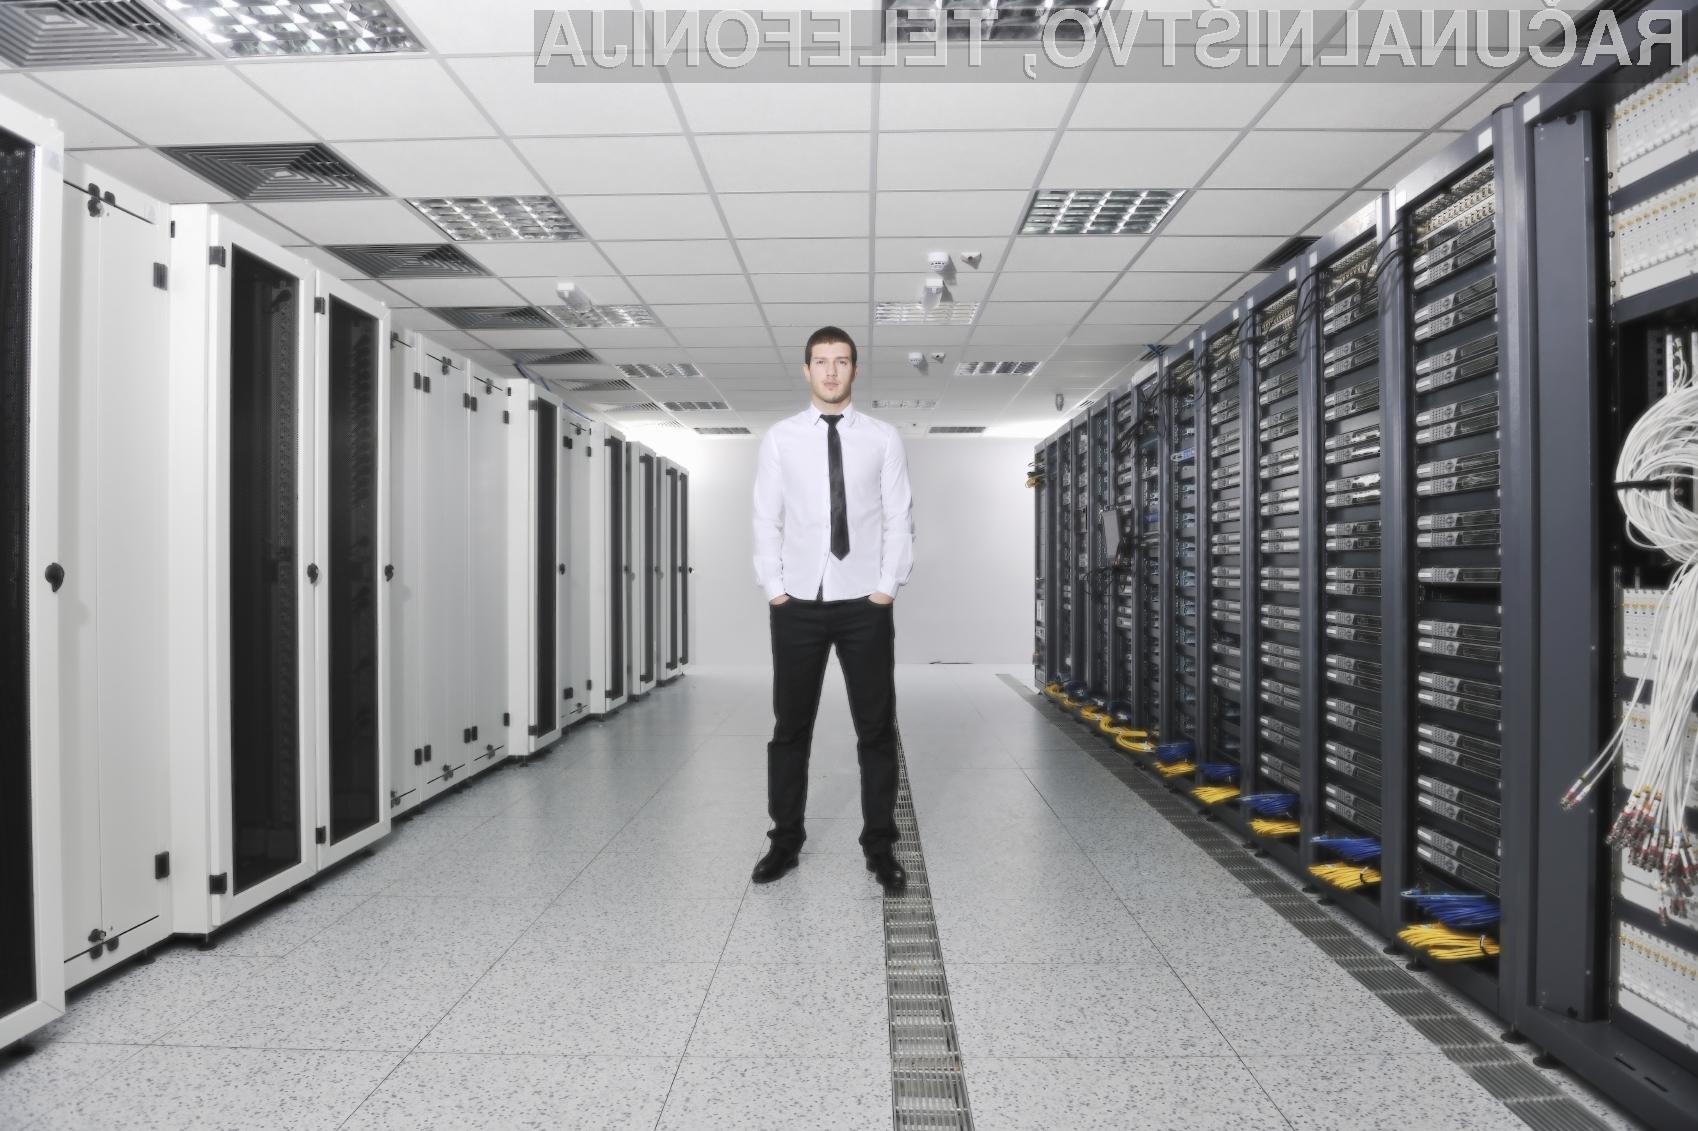 Rdeča nit letošnje konference bo energetska učinkovitost podatkovnih centrov.